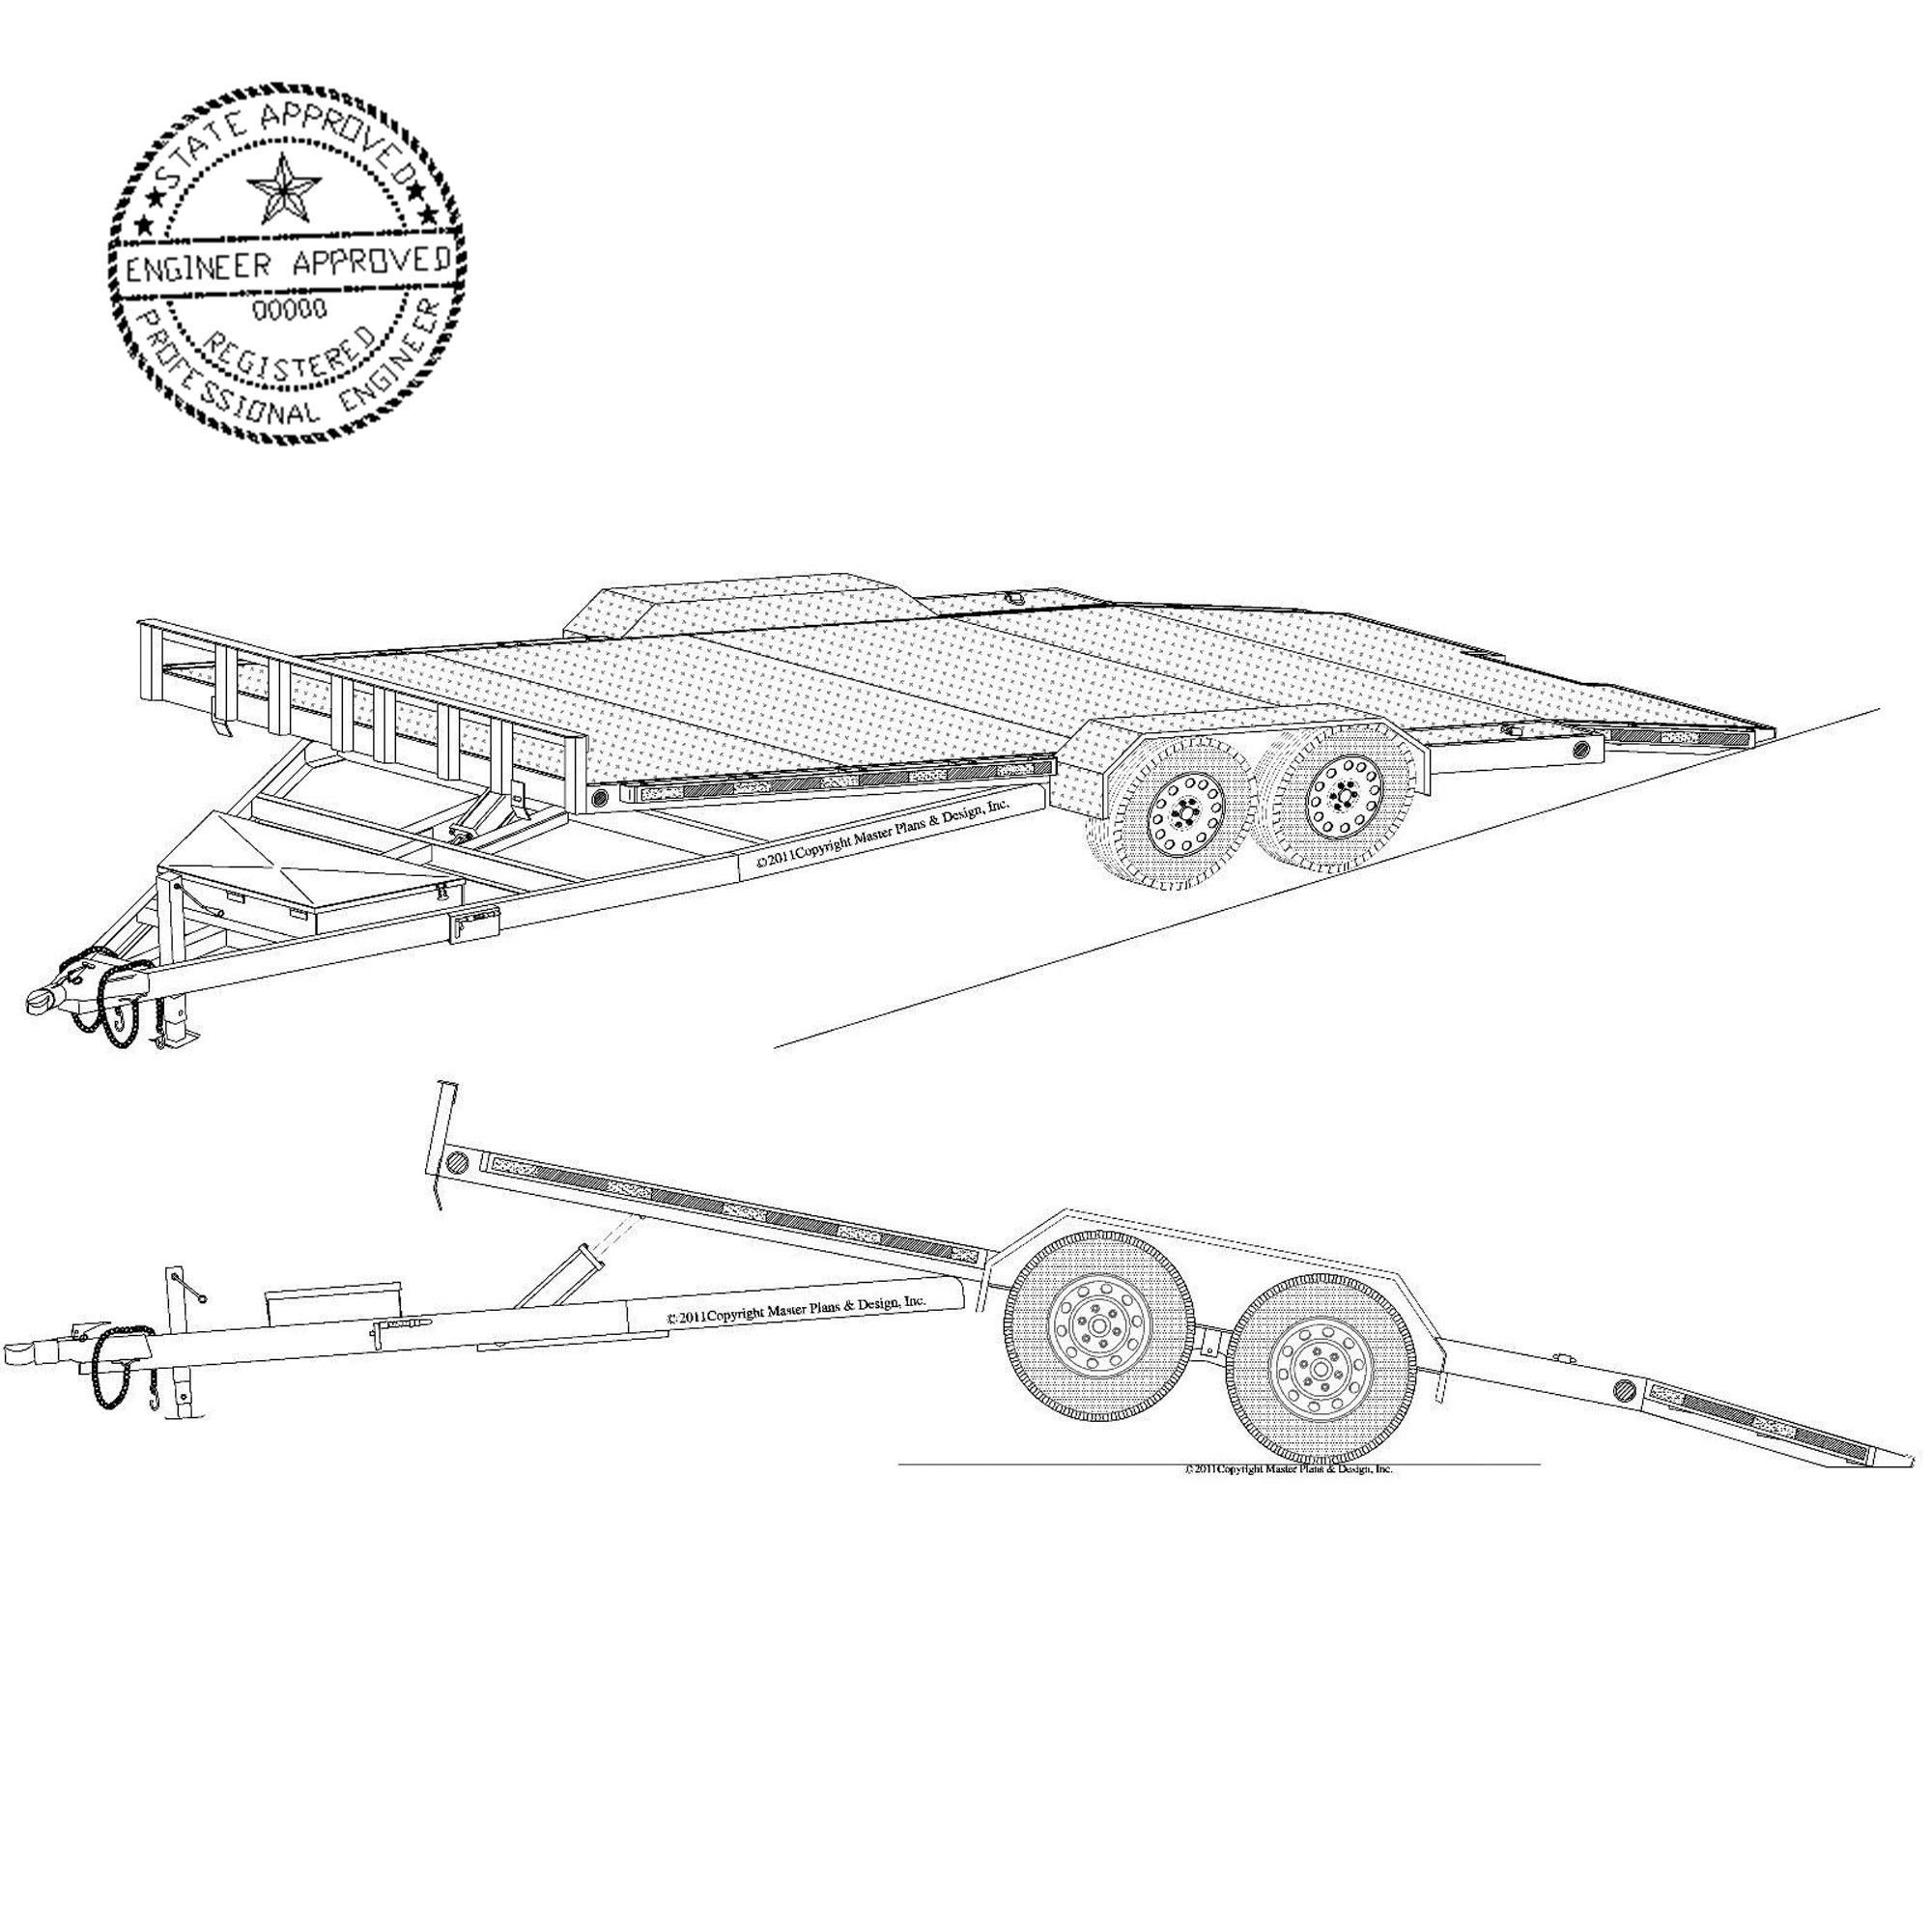 19 x 82 hydraulic car hauler trailer plans blueprints model 18ht